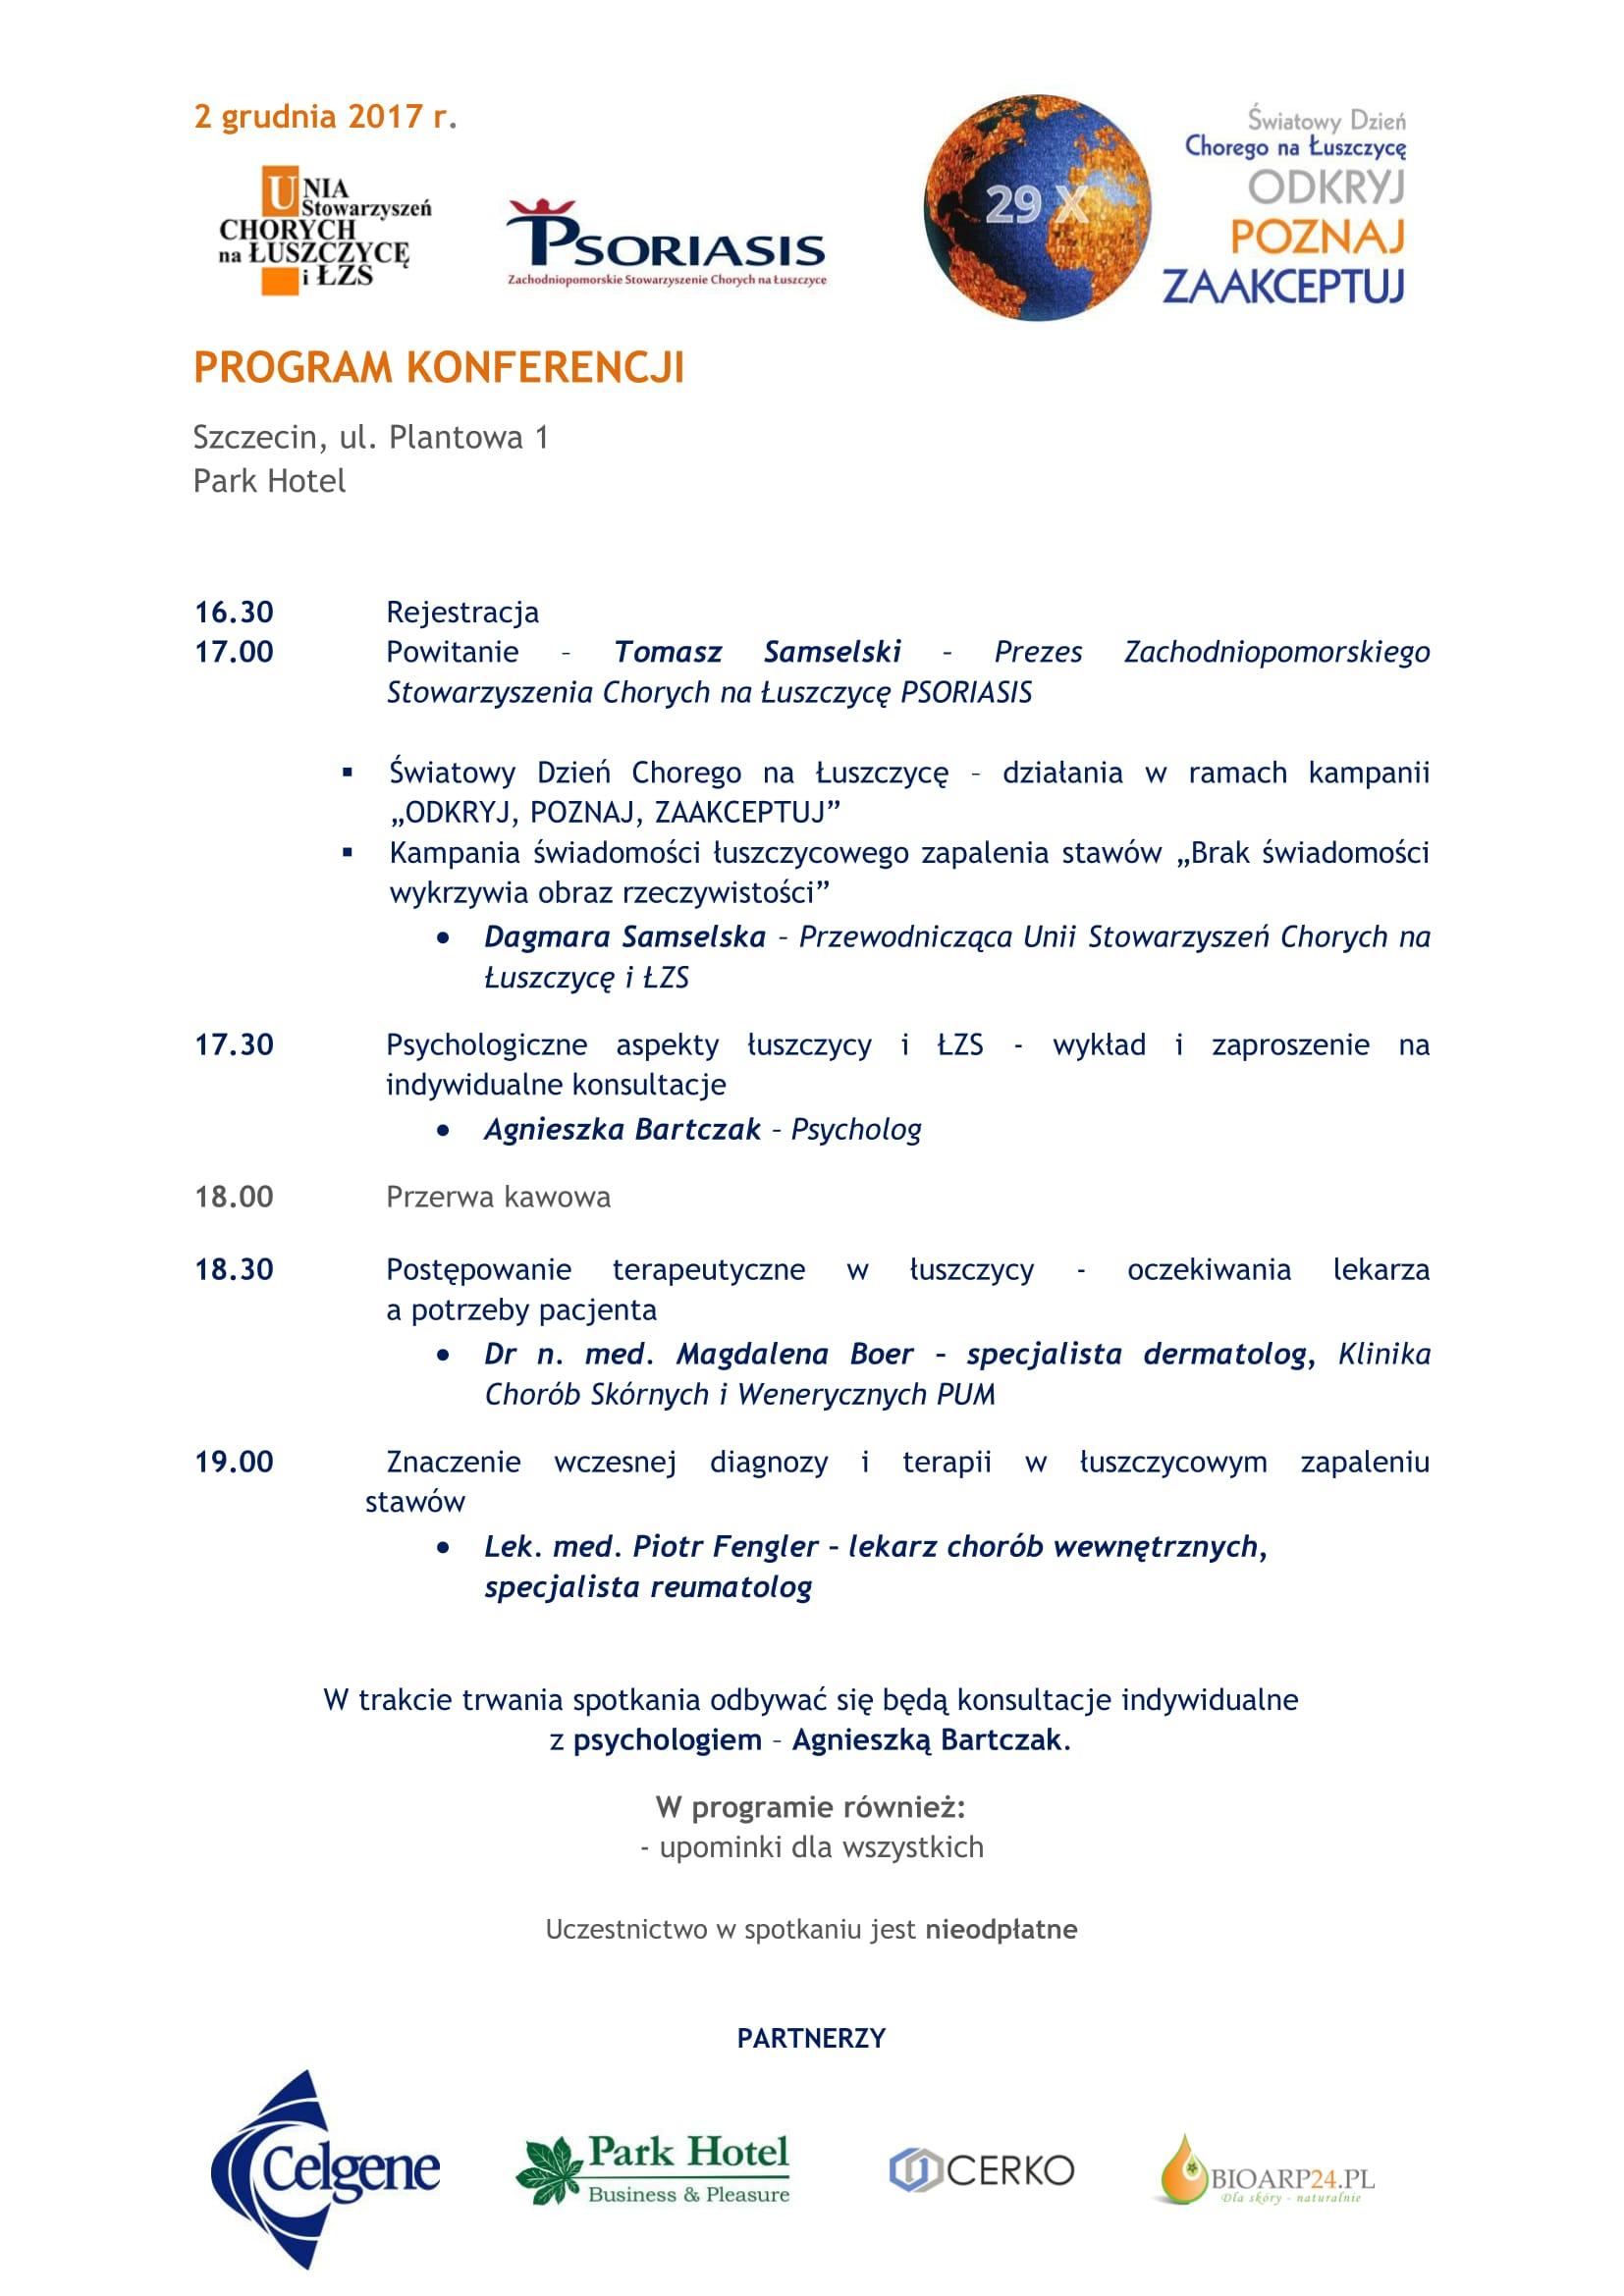 program-konferencji-wpd-2.12.2017-1